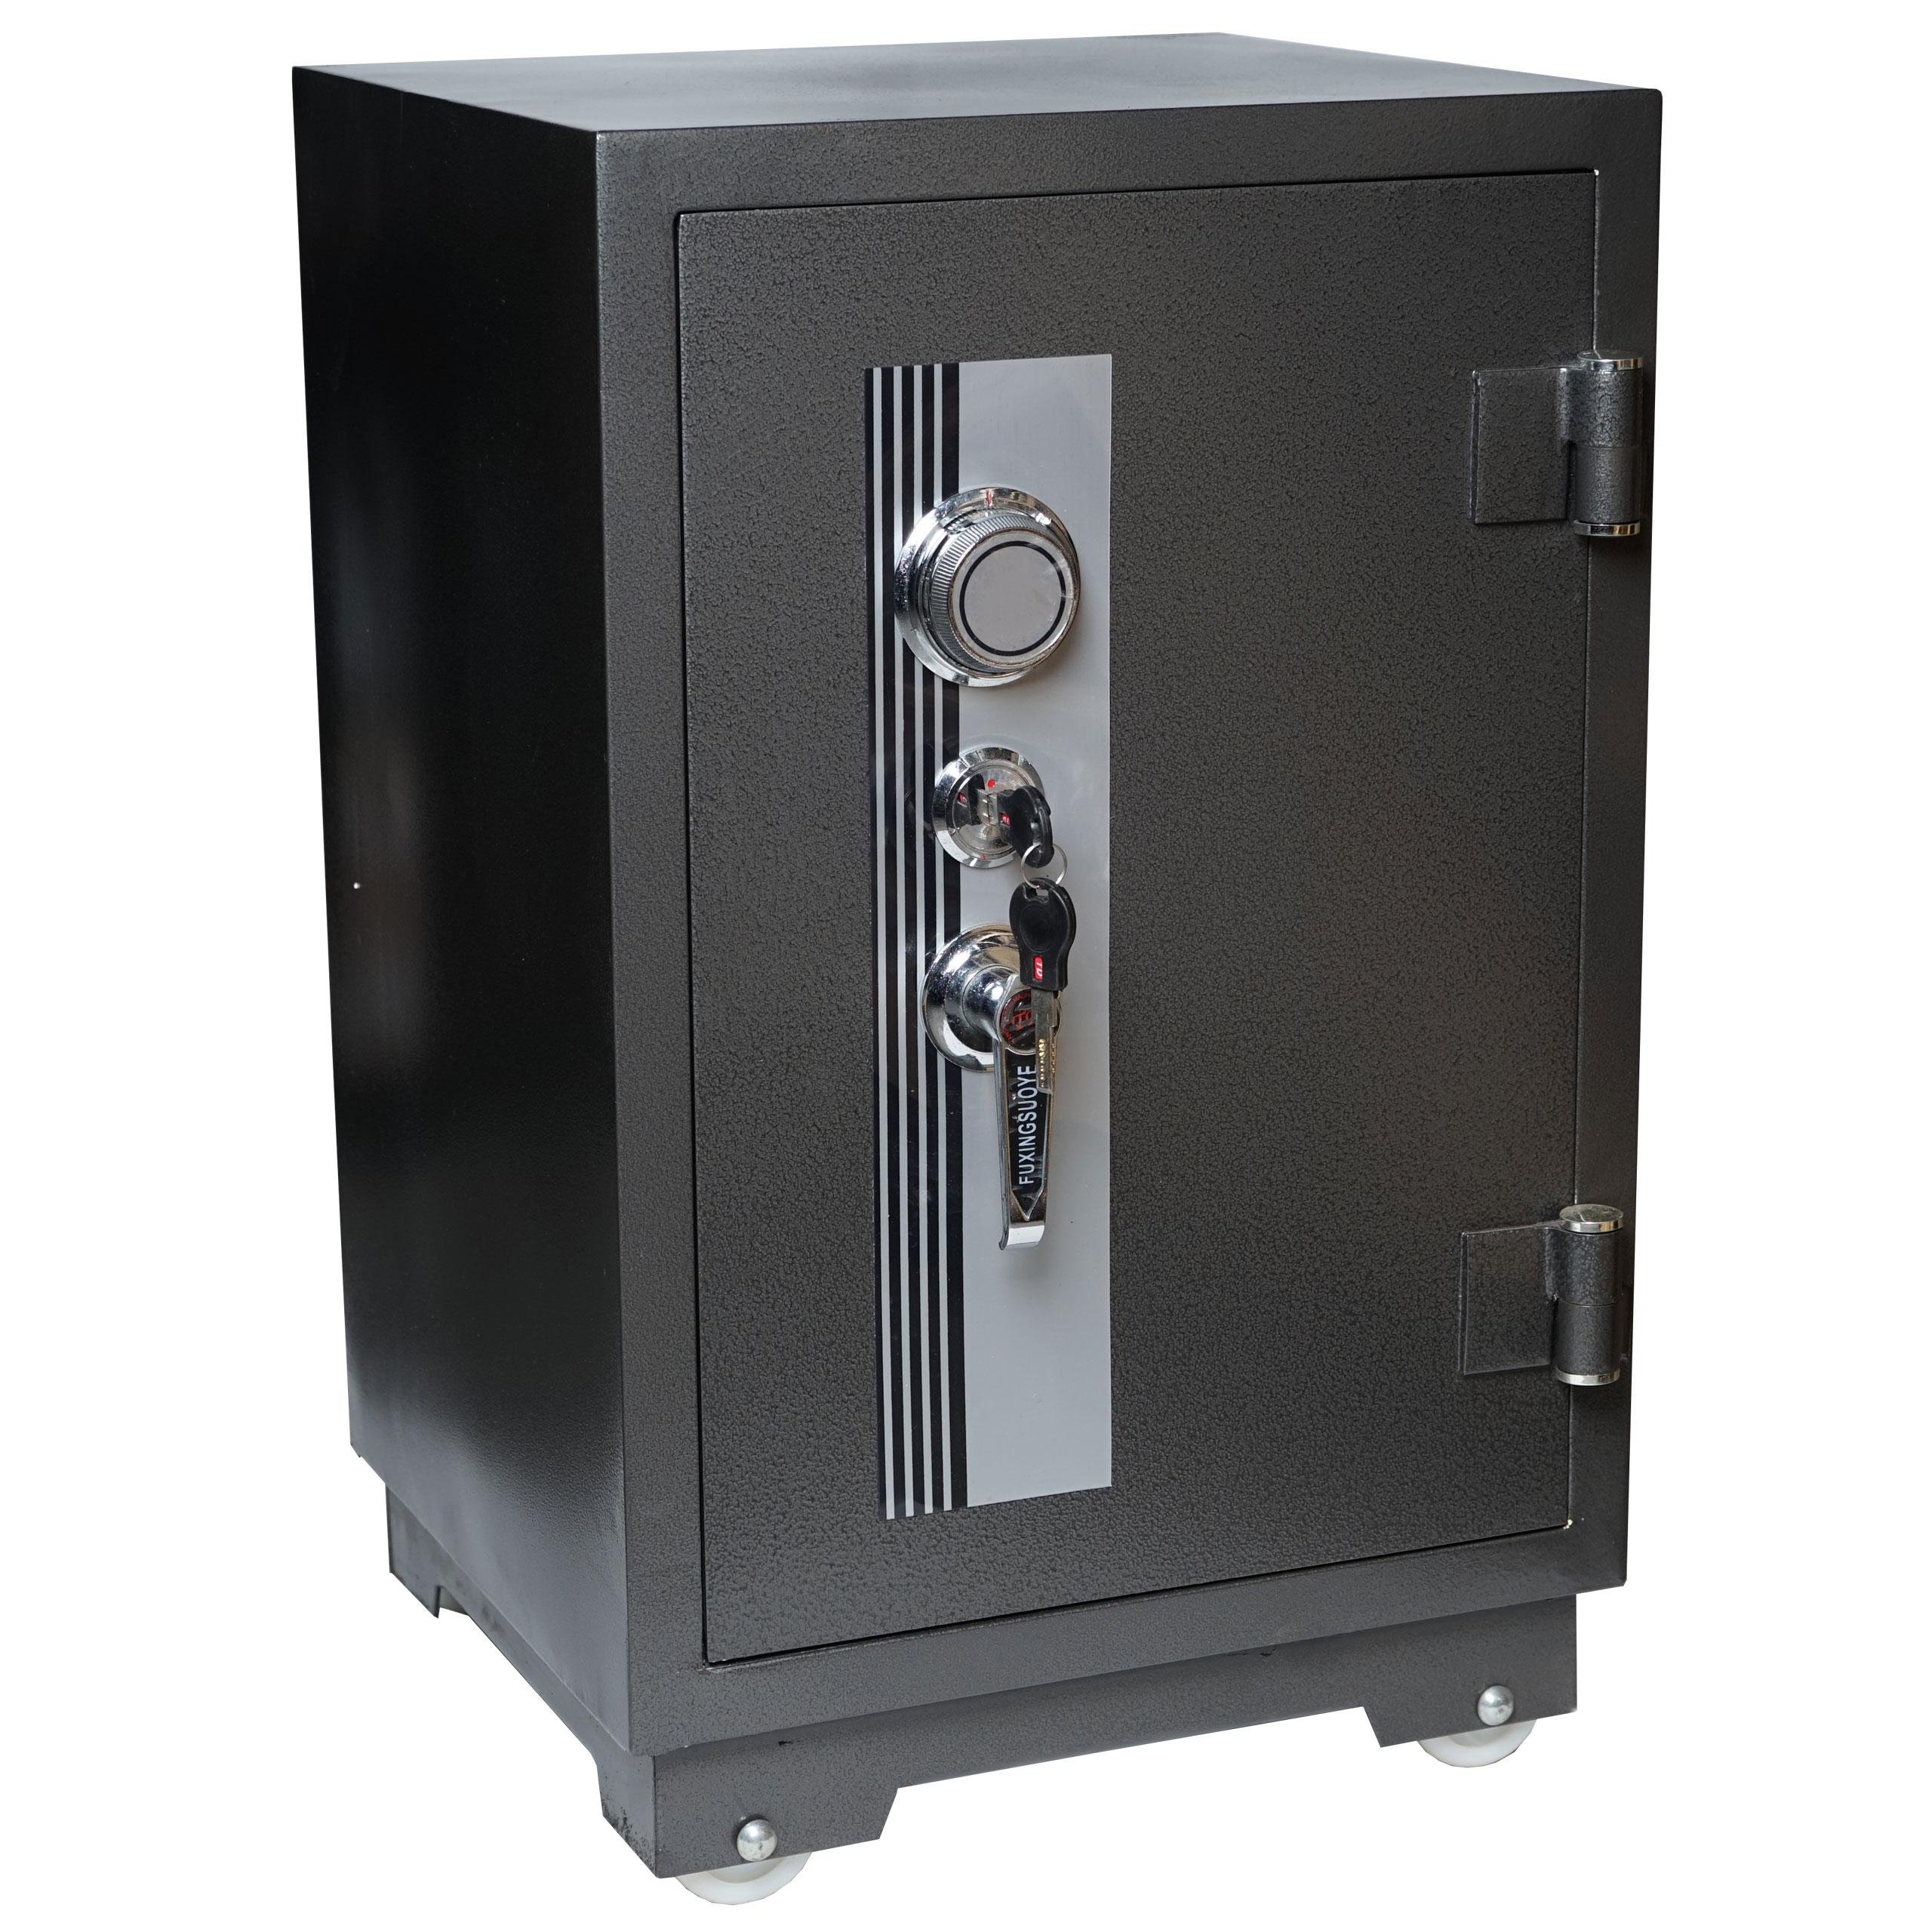 tresor t243 panzerschrank safe 1h feuerfest bis 1010 c. Black Bedroom Furniture Sets. Home Design Ideas